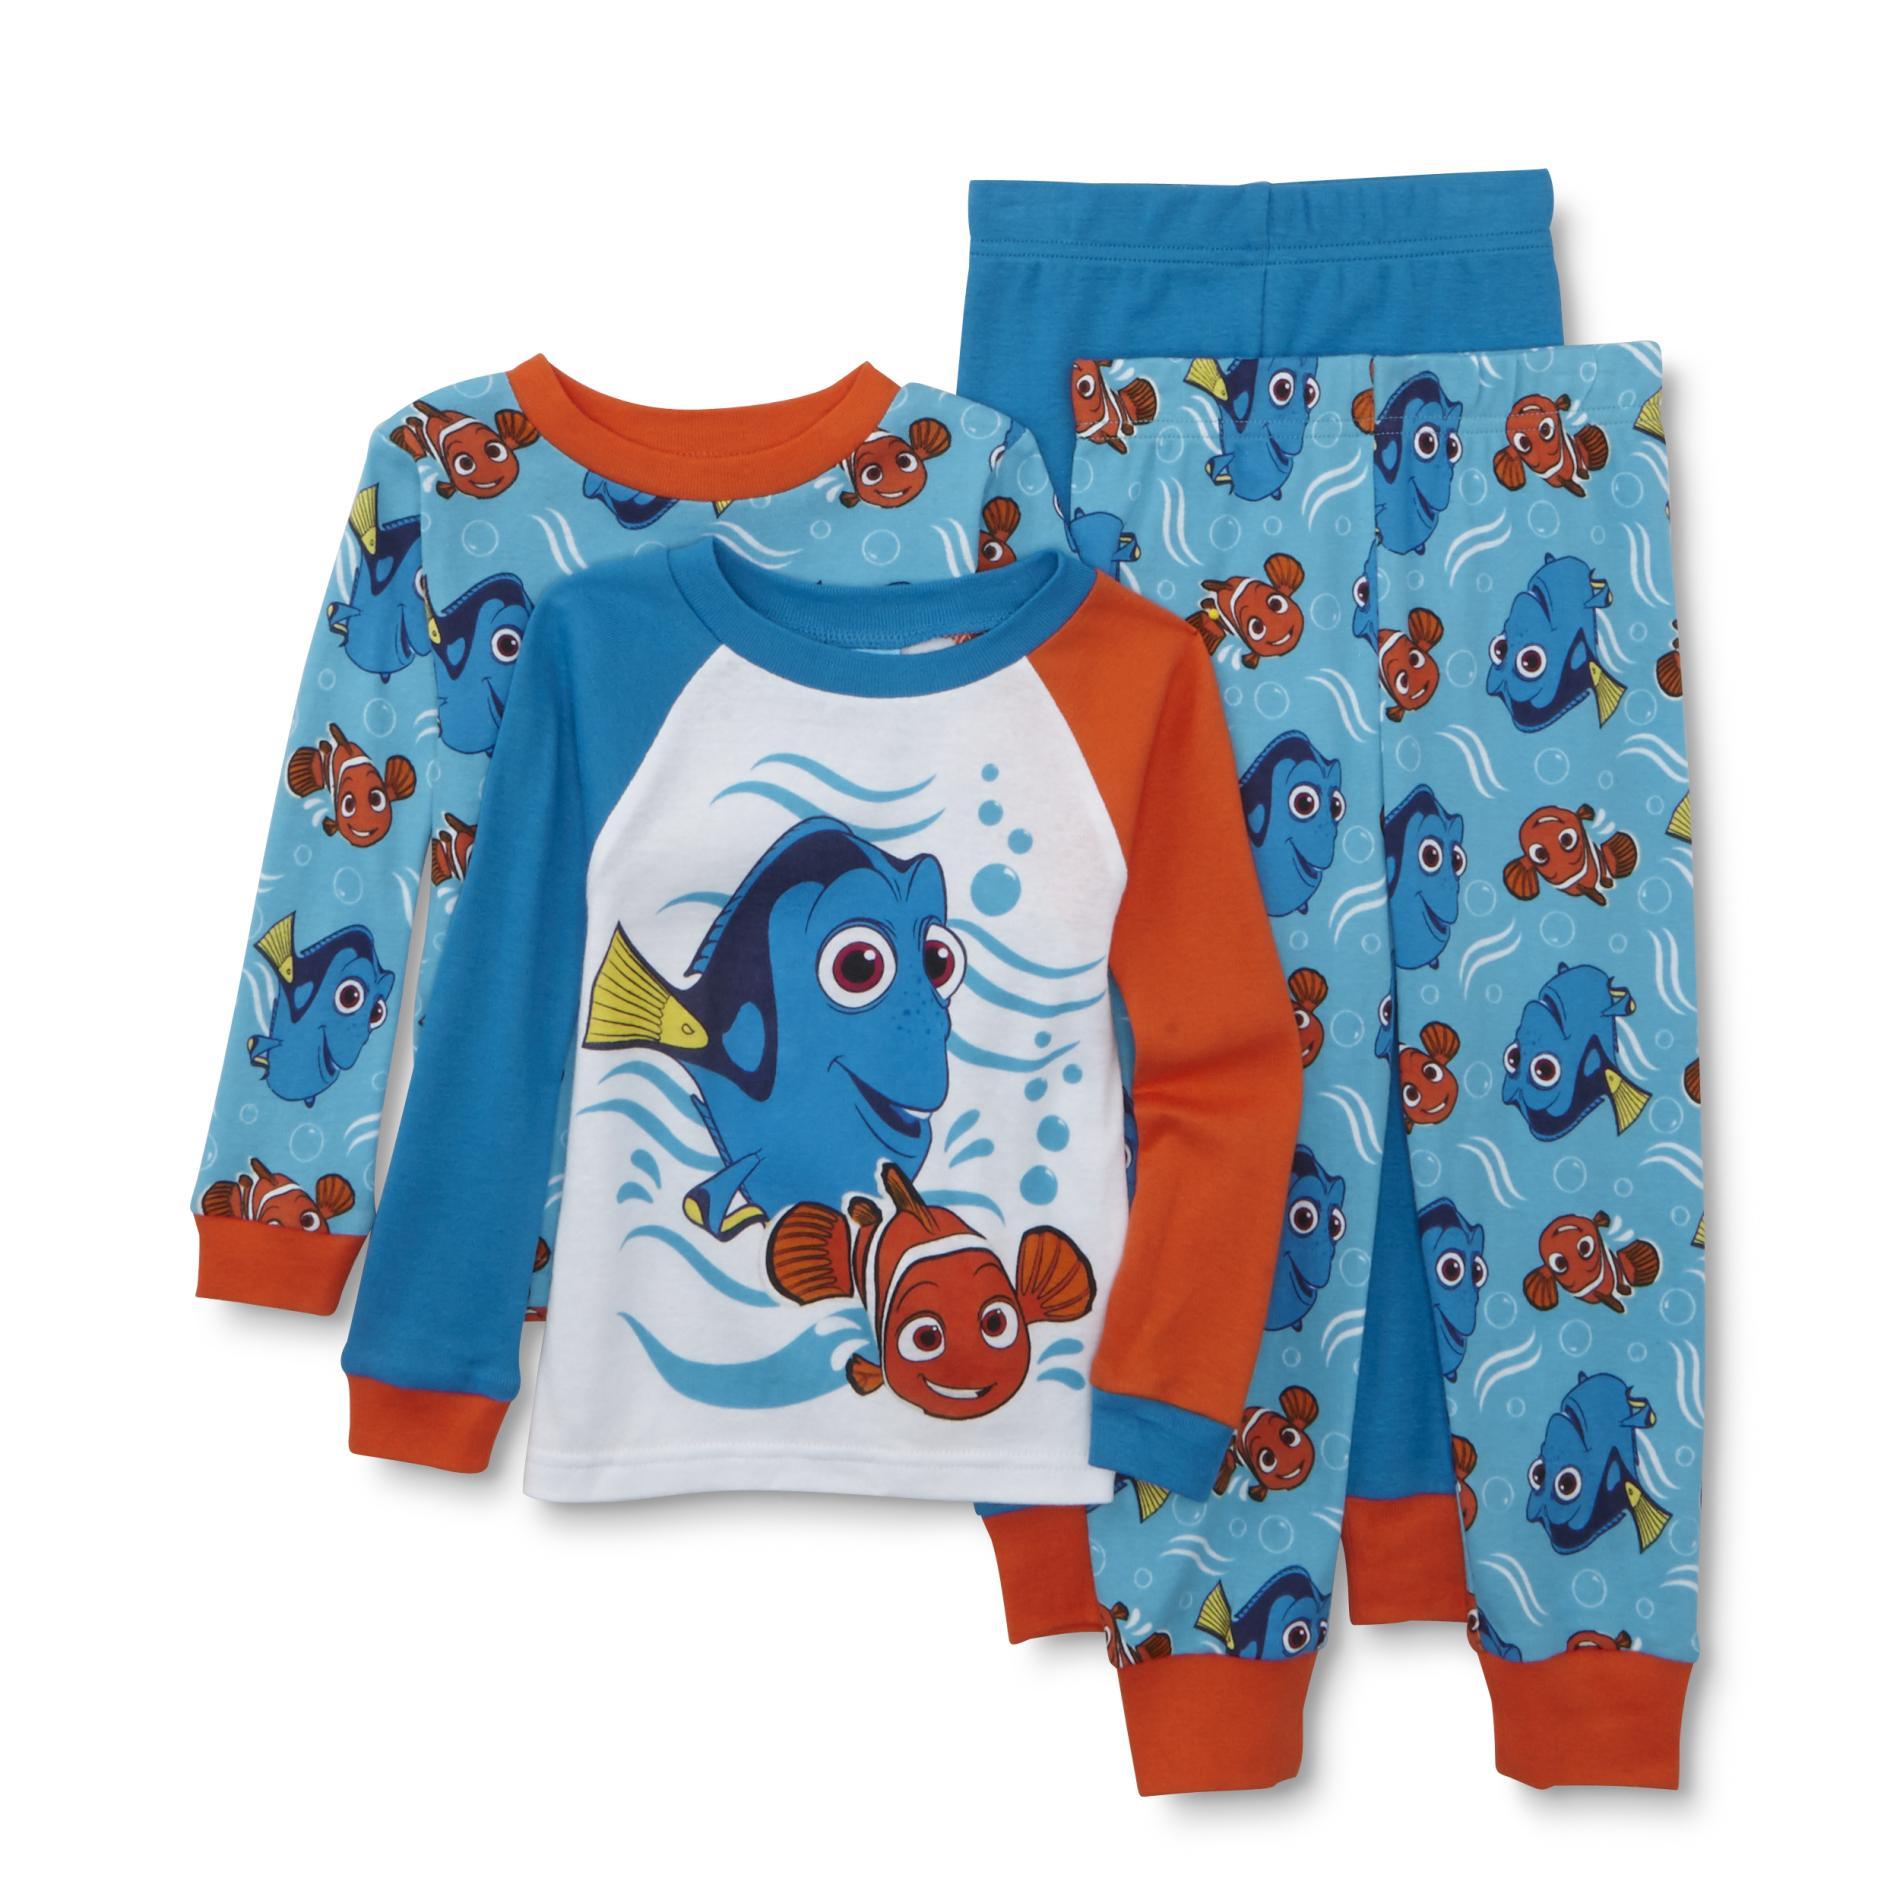 Disney Baby Finding Dory Toddler Boy's 2-Pairs Pajamas